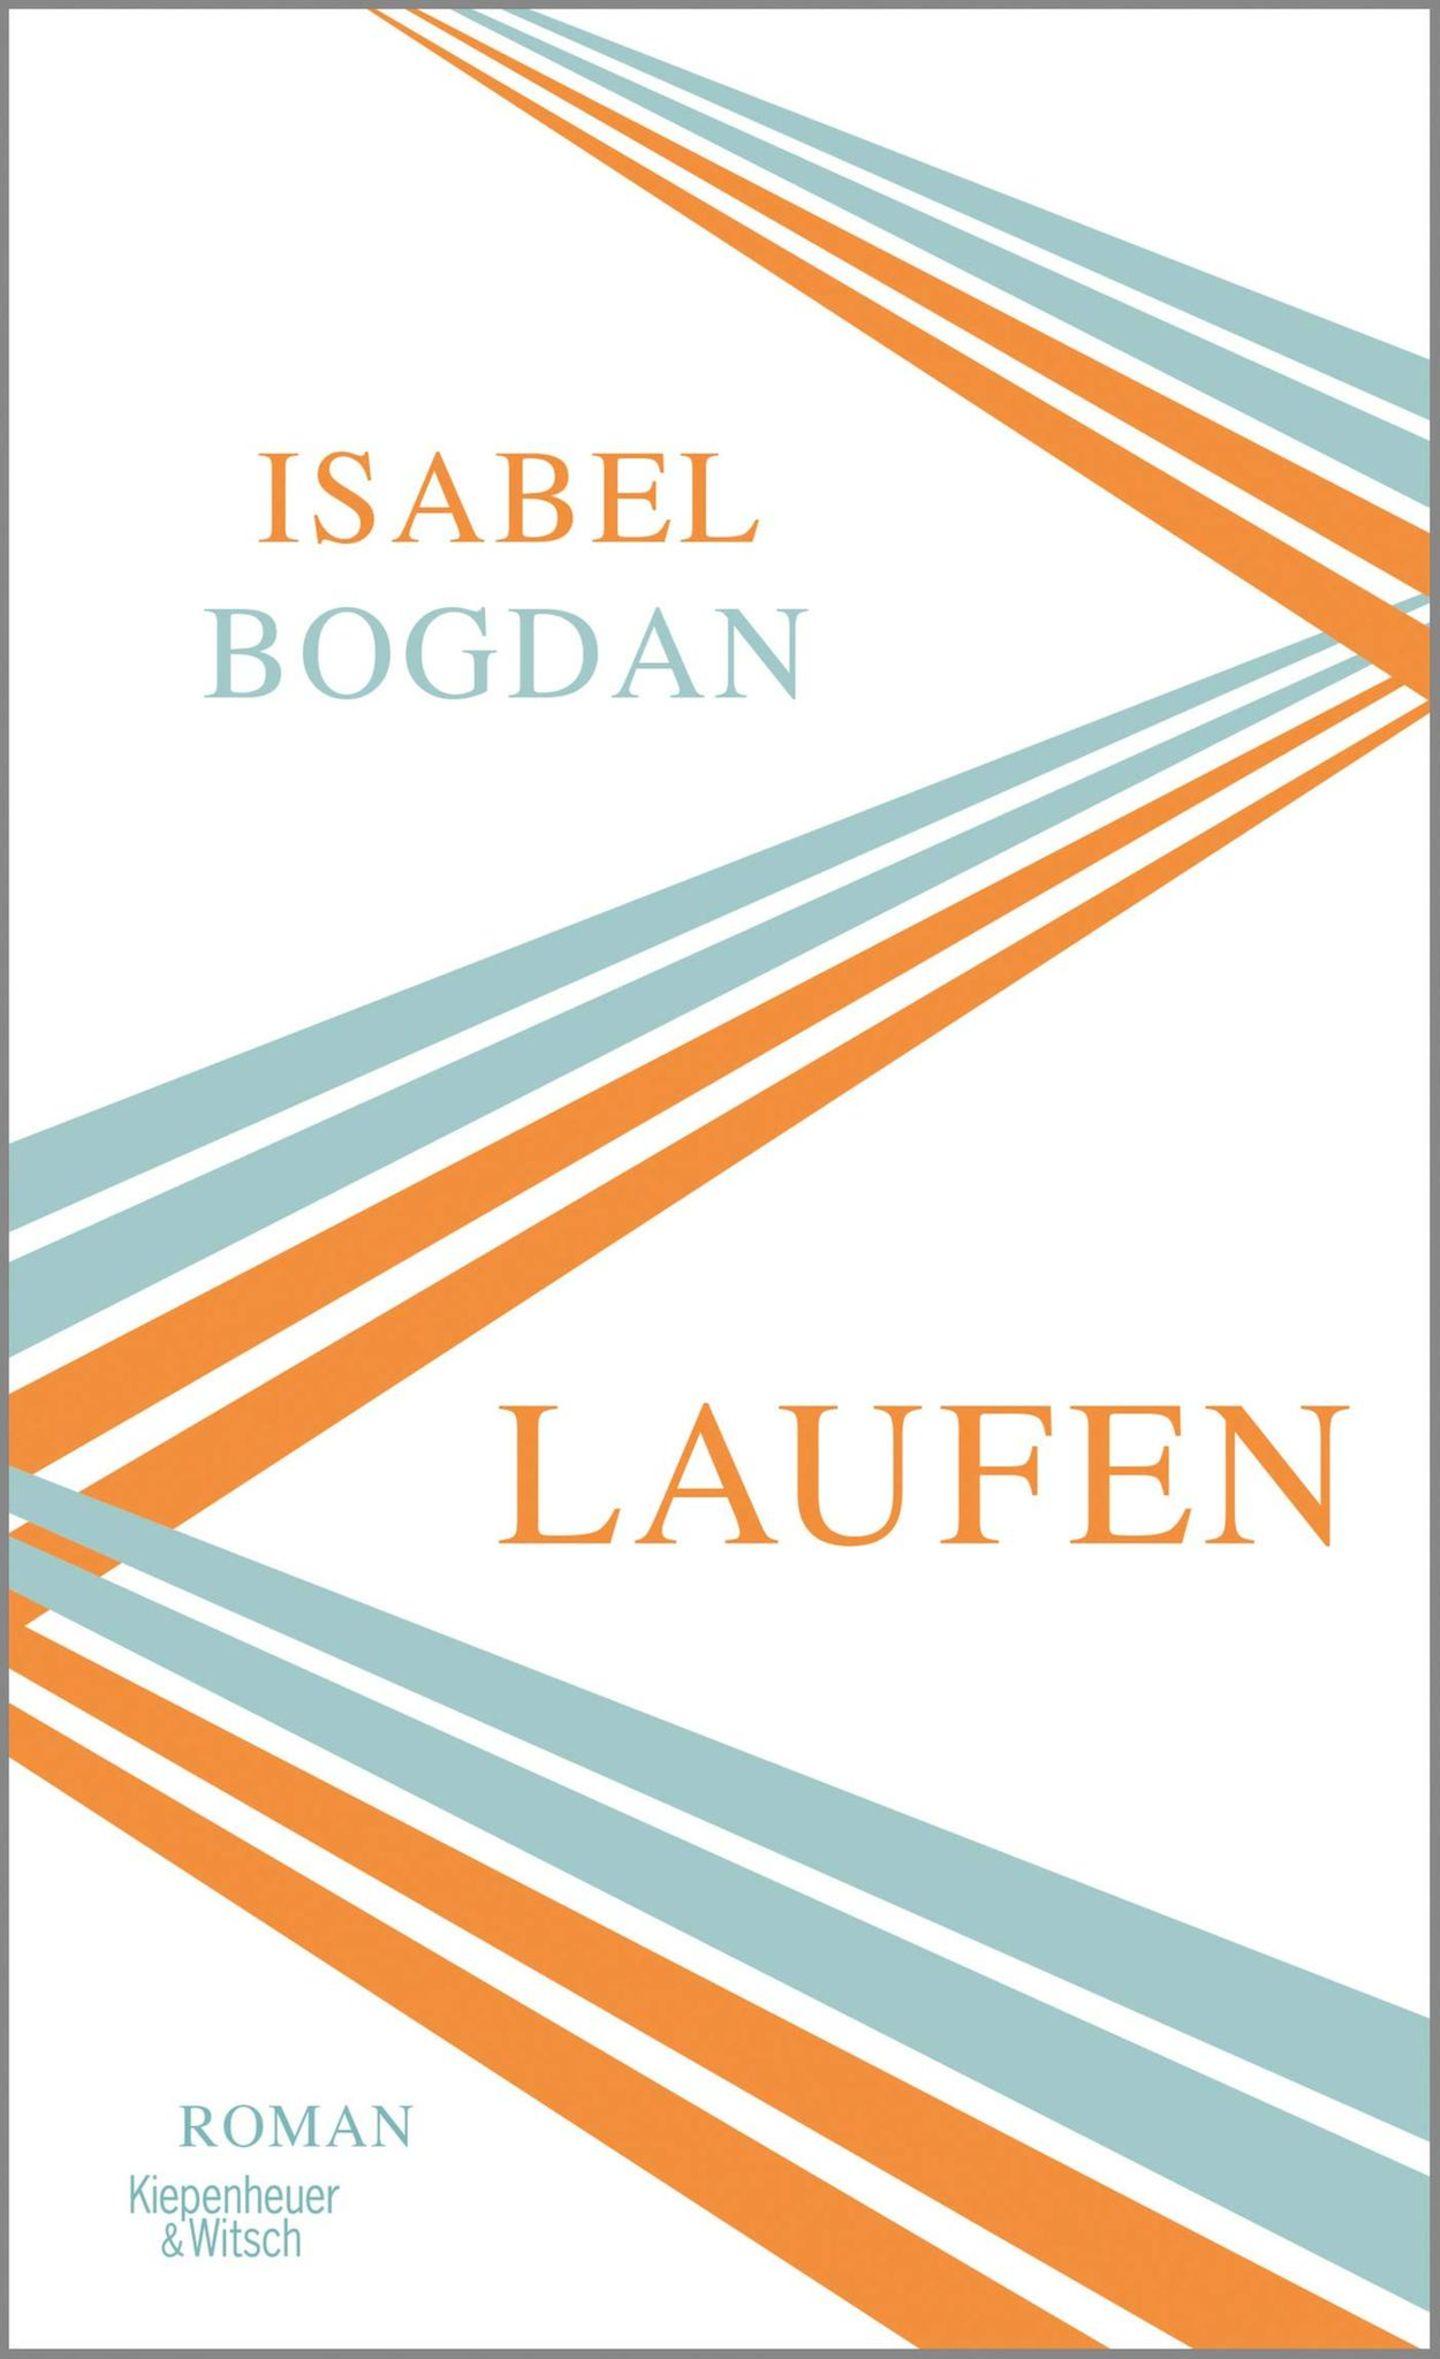 Laufen – Isabel Bogdan